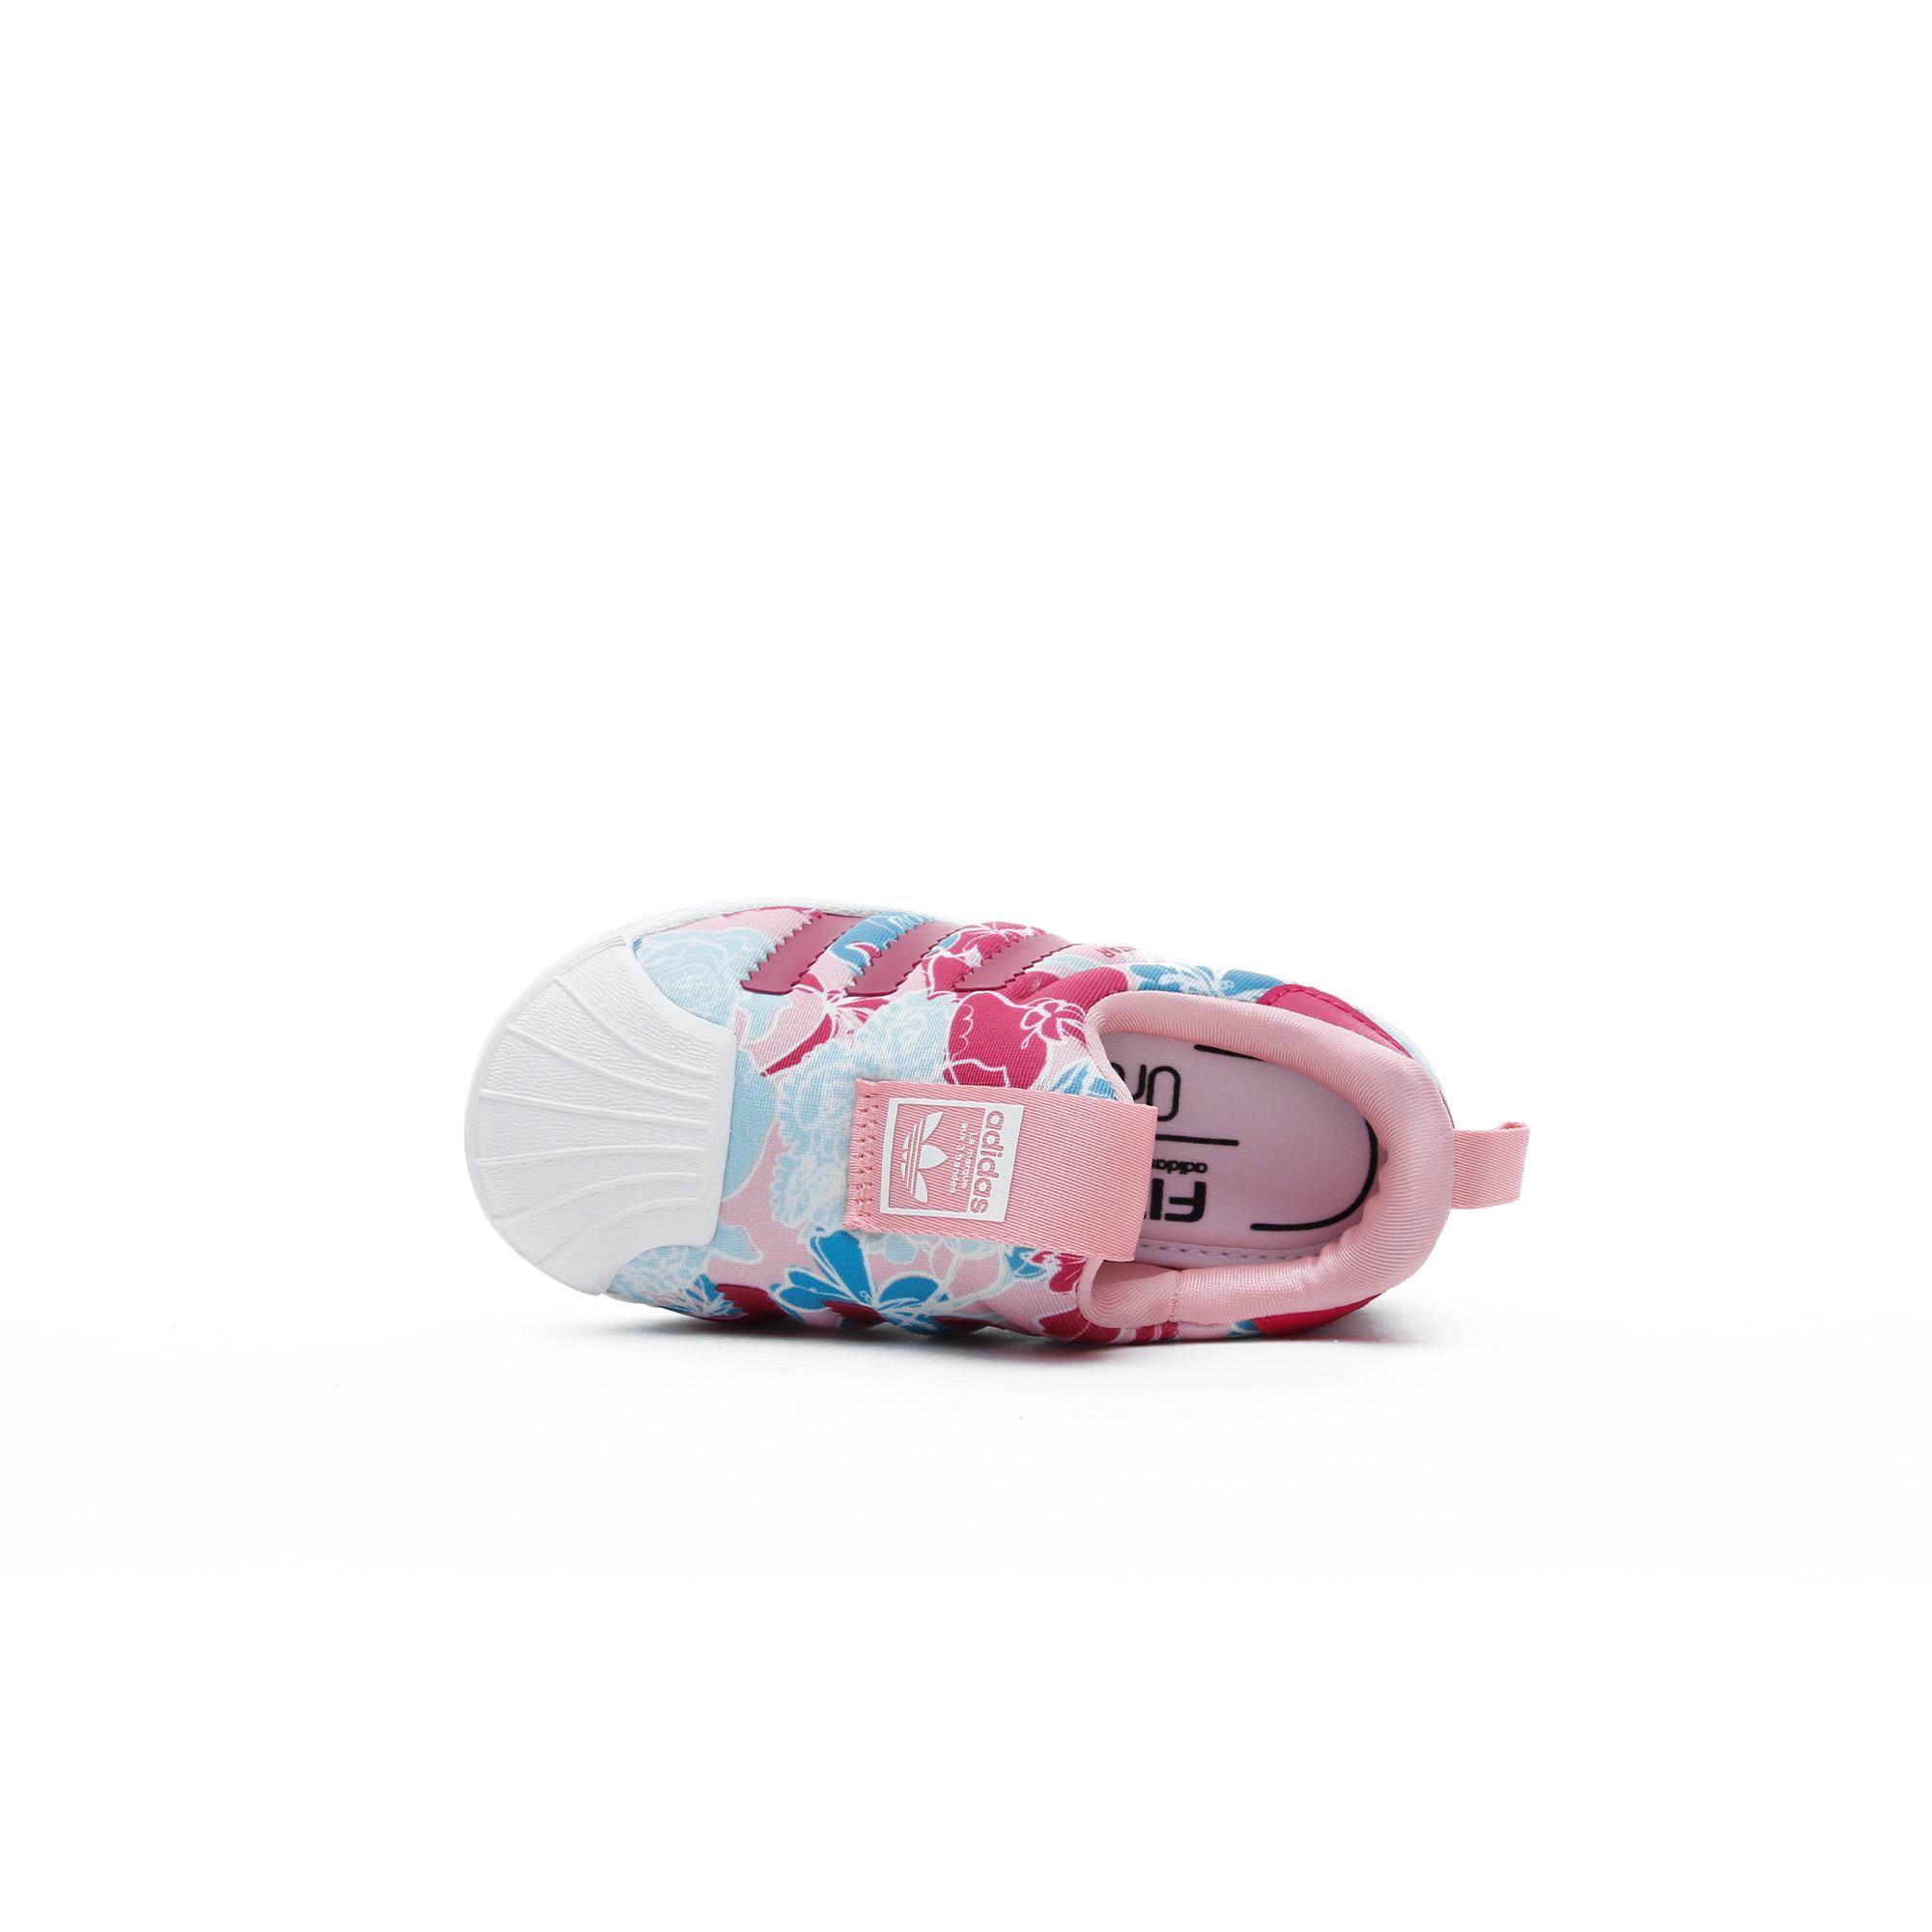 adidas Superstar 360 Bebek Pembe Spor Ayakkabı